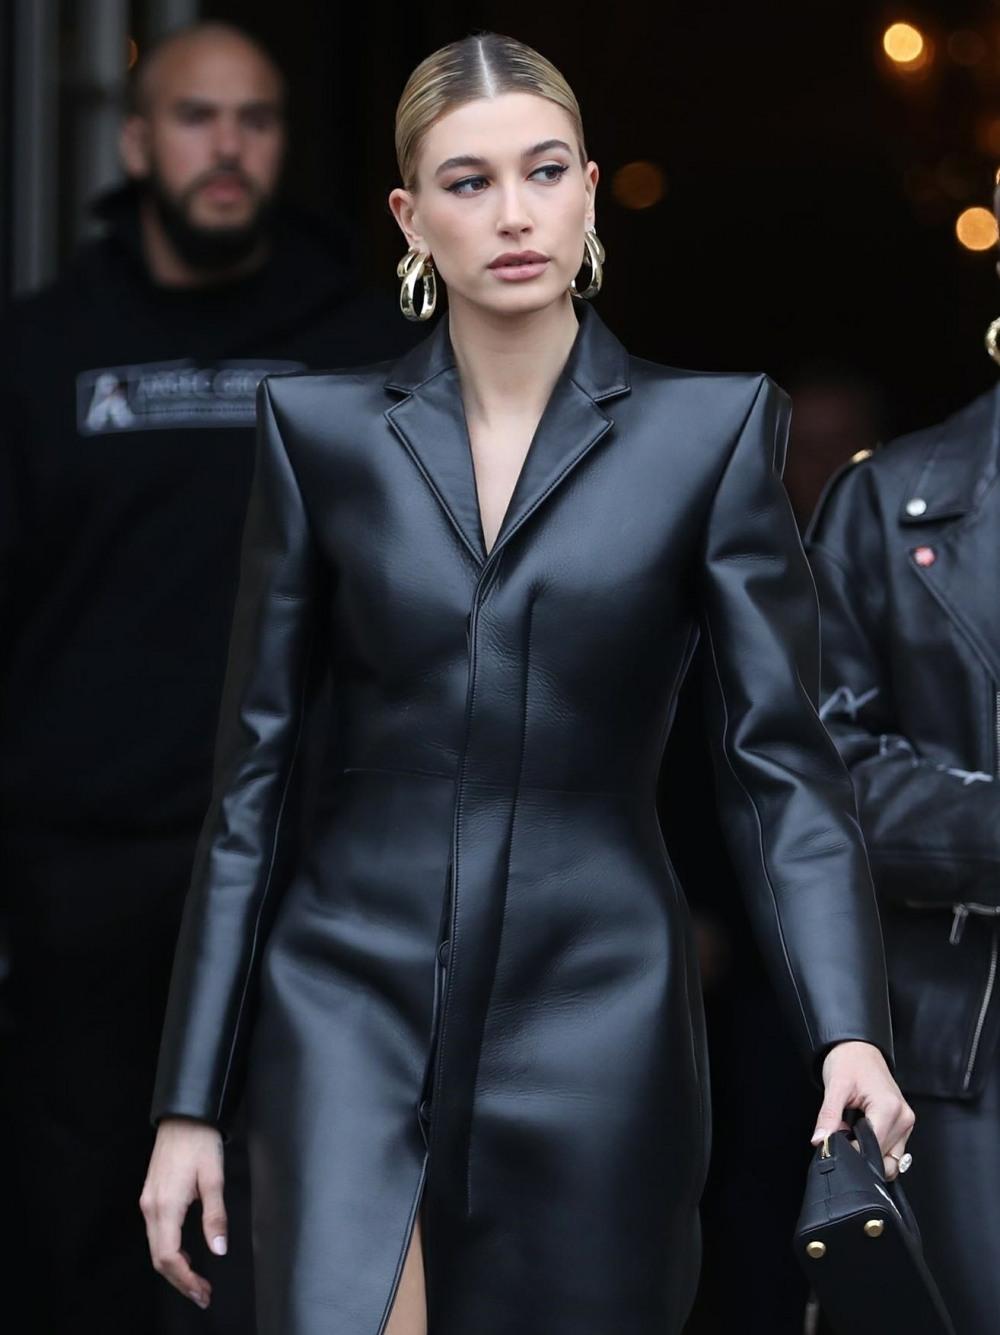 Hailey Baldwin is seen leaving the Crillon Hotel during Paris Fashion Week